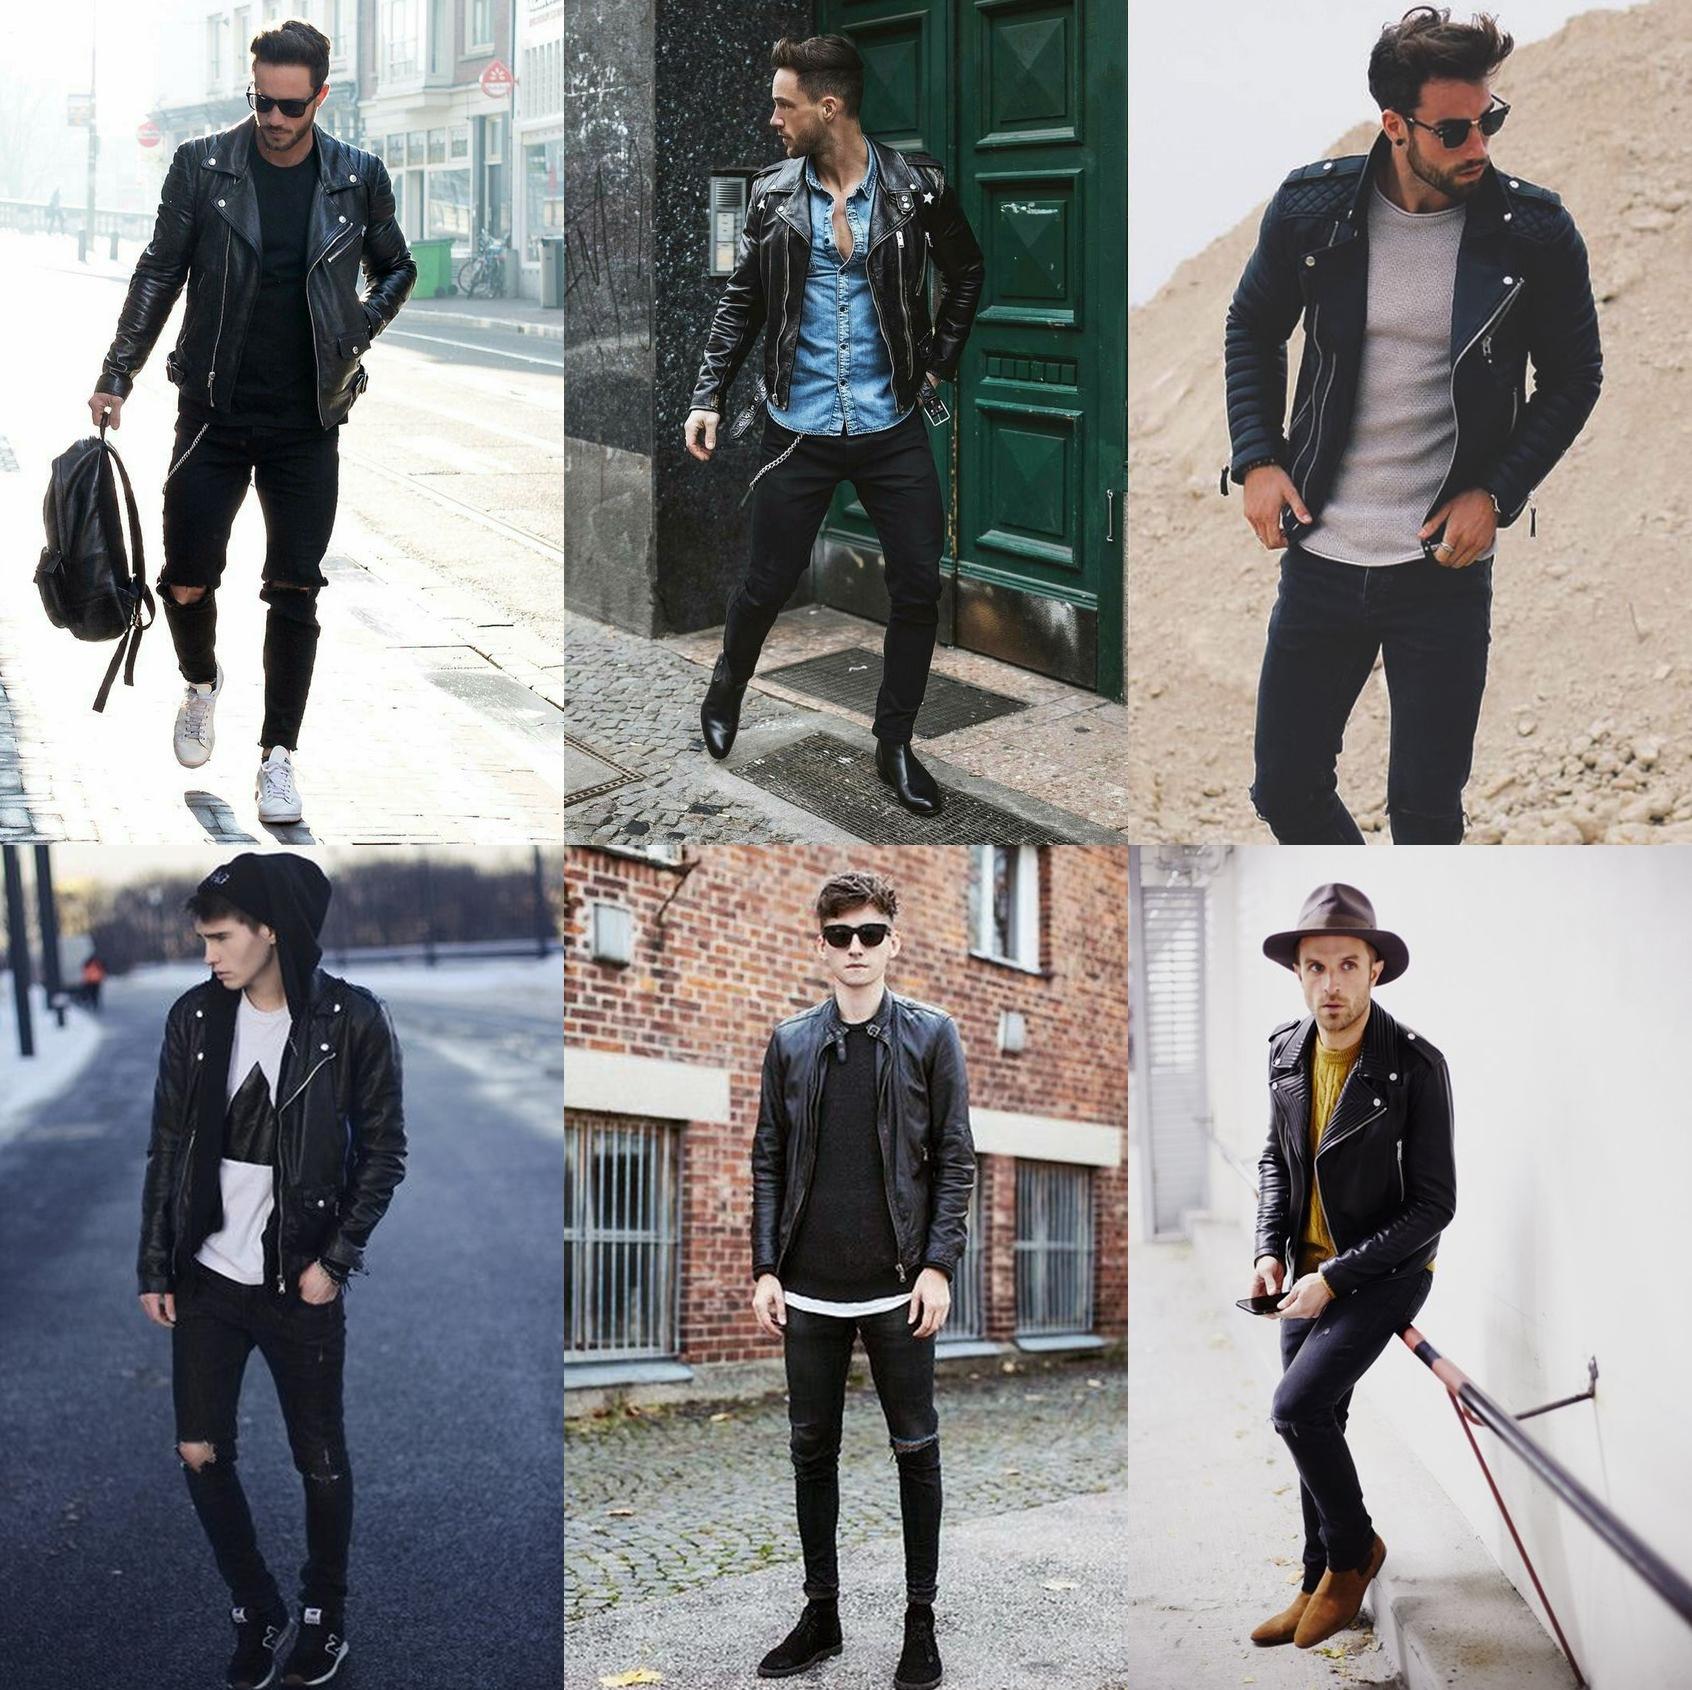 jaqueta masculina, , jacket for men, tendencia de moda masculina 2017, look masculino 2017, estilo masculino, blog de moda masculina, moda sem censura, alex cursino, 4